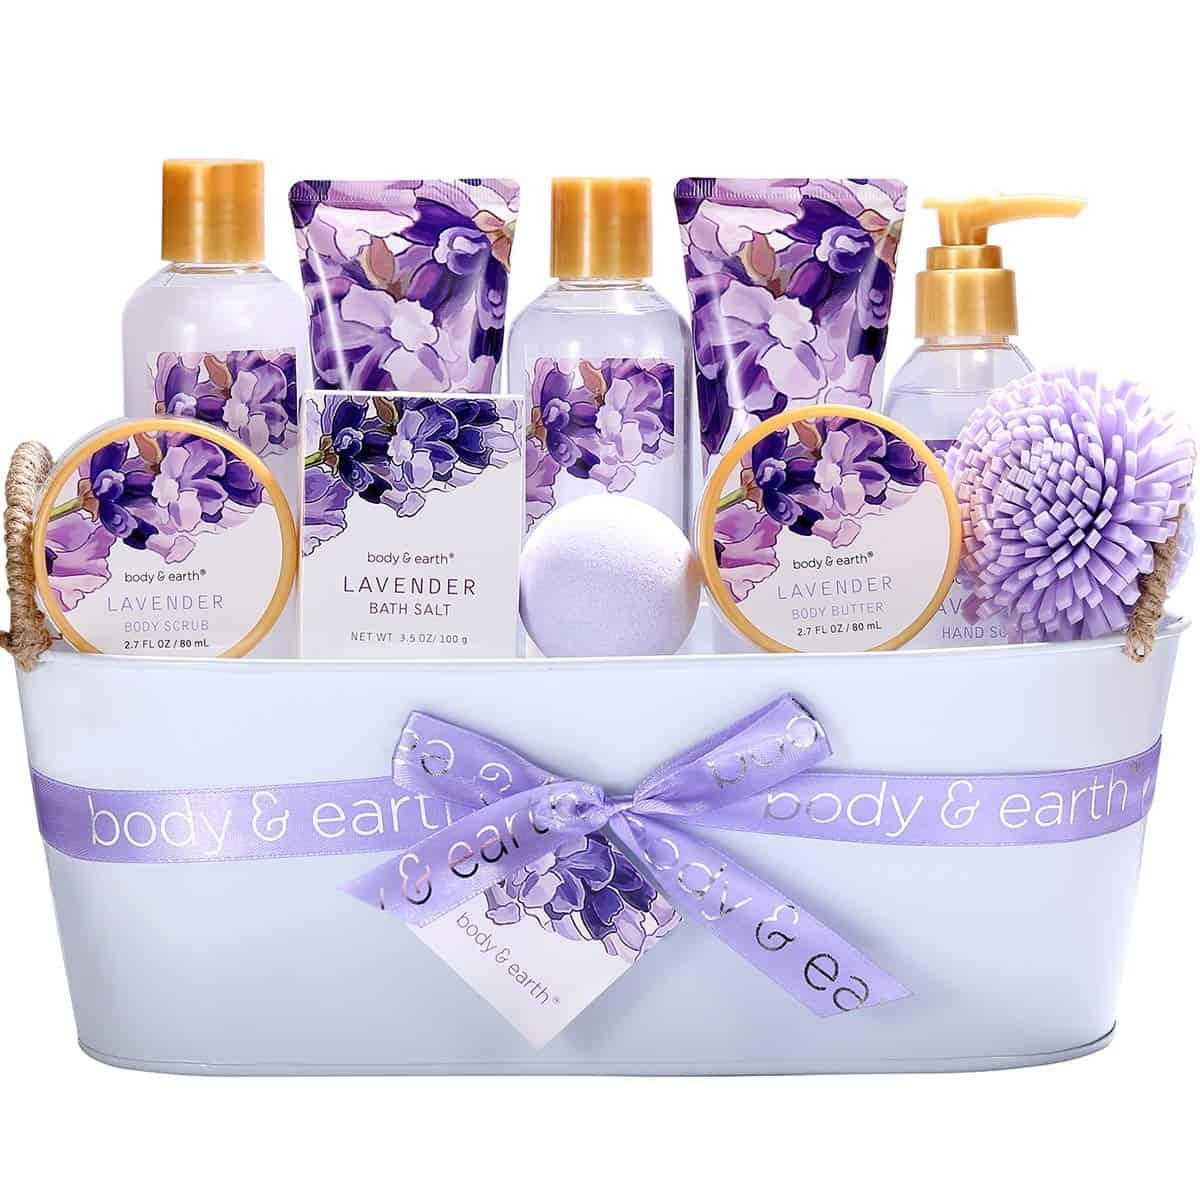 Lavender gift set - self care advice - self-care tips